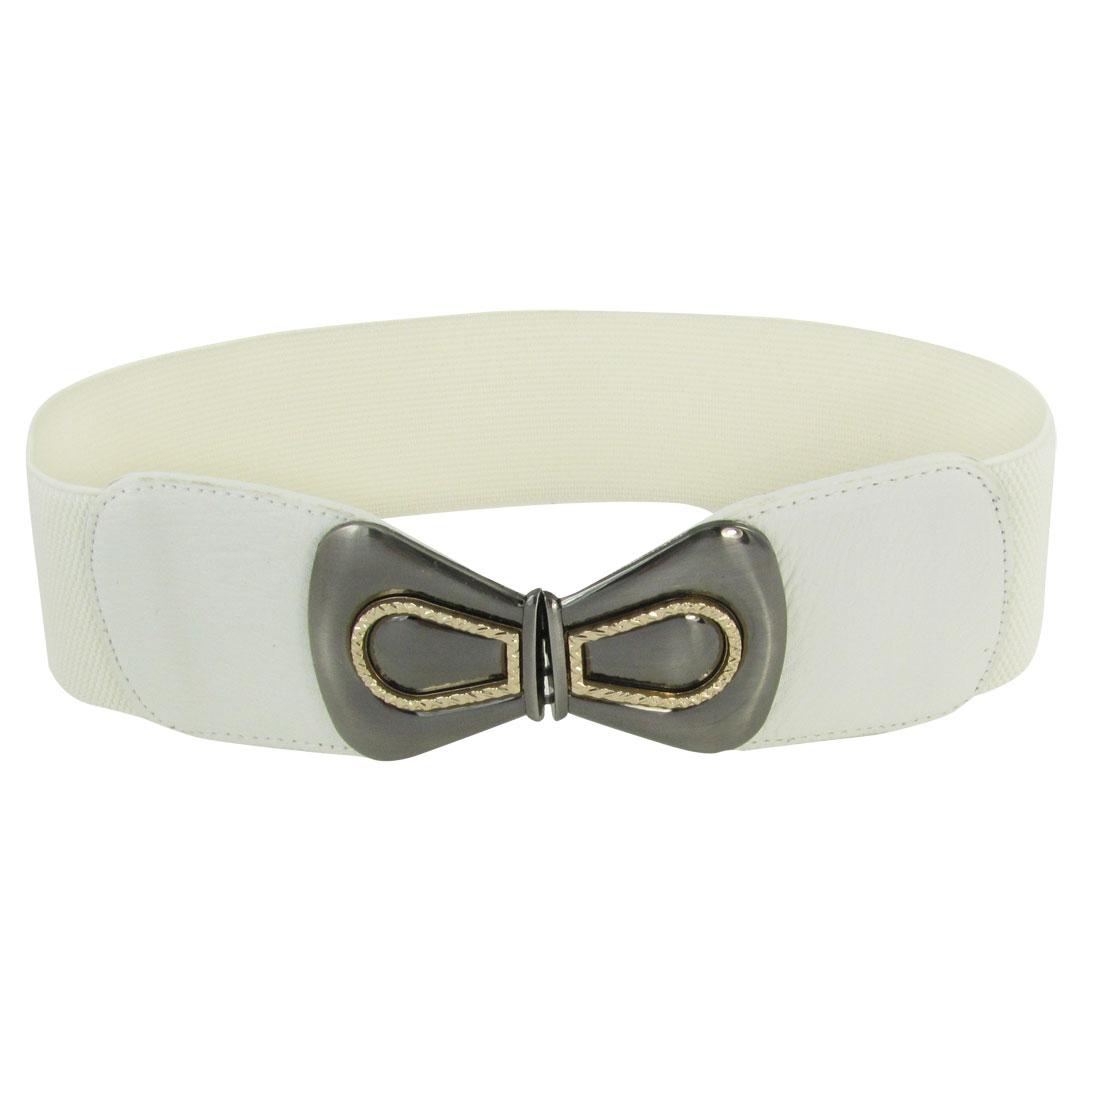 Lady Bowknot Design Metal Interlocking Buckle Spandex Cinch Band Waistbelt White